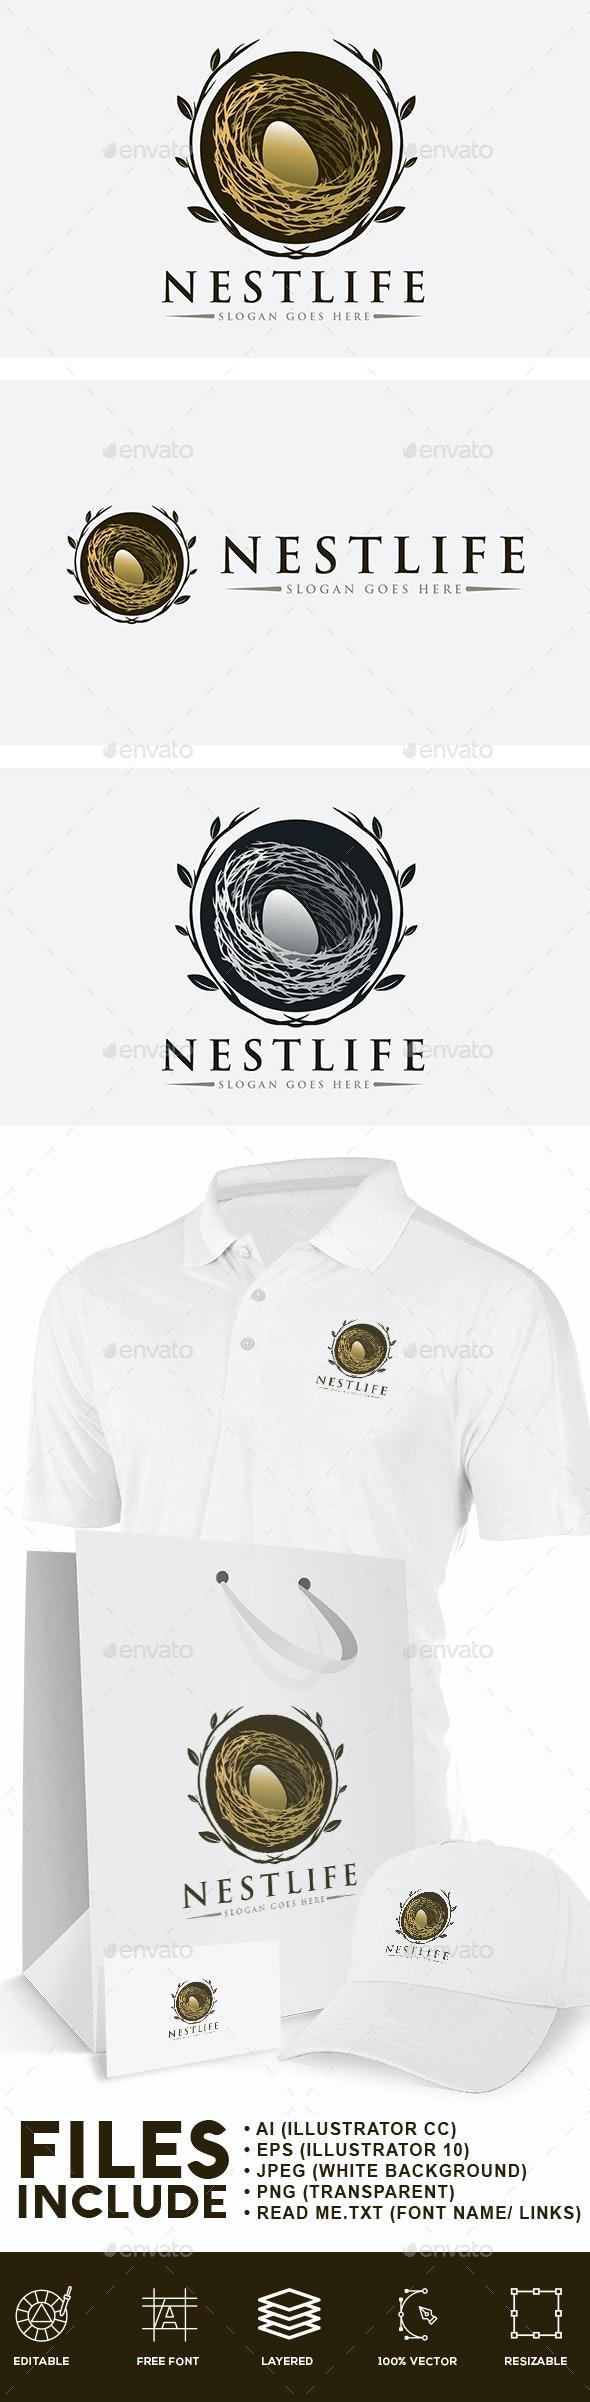 Bird Nest Logo - Nature Logo Templates